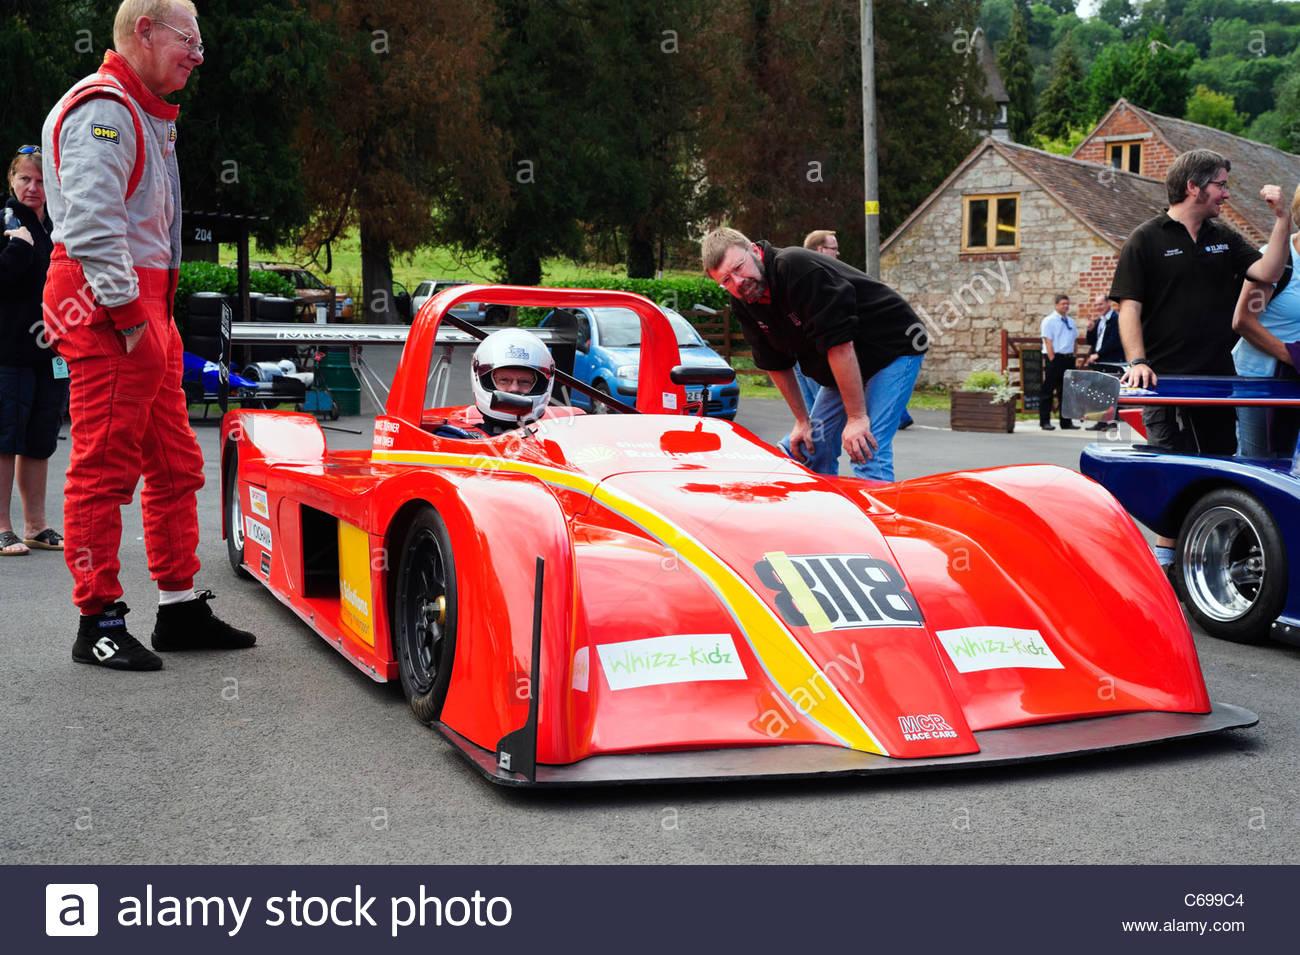 John Owen driving an MCR S2000 racing car at Shelsley Walsh Hill climb, Worcester, England, UK. - Stock Image